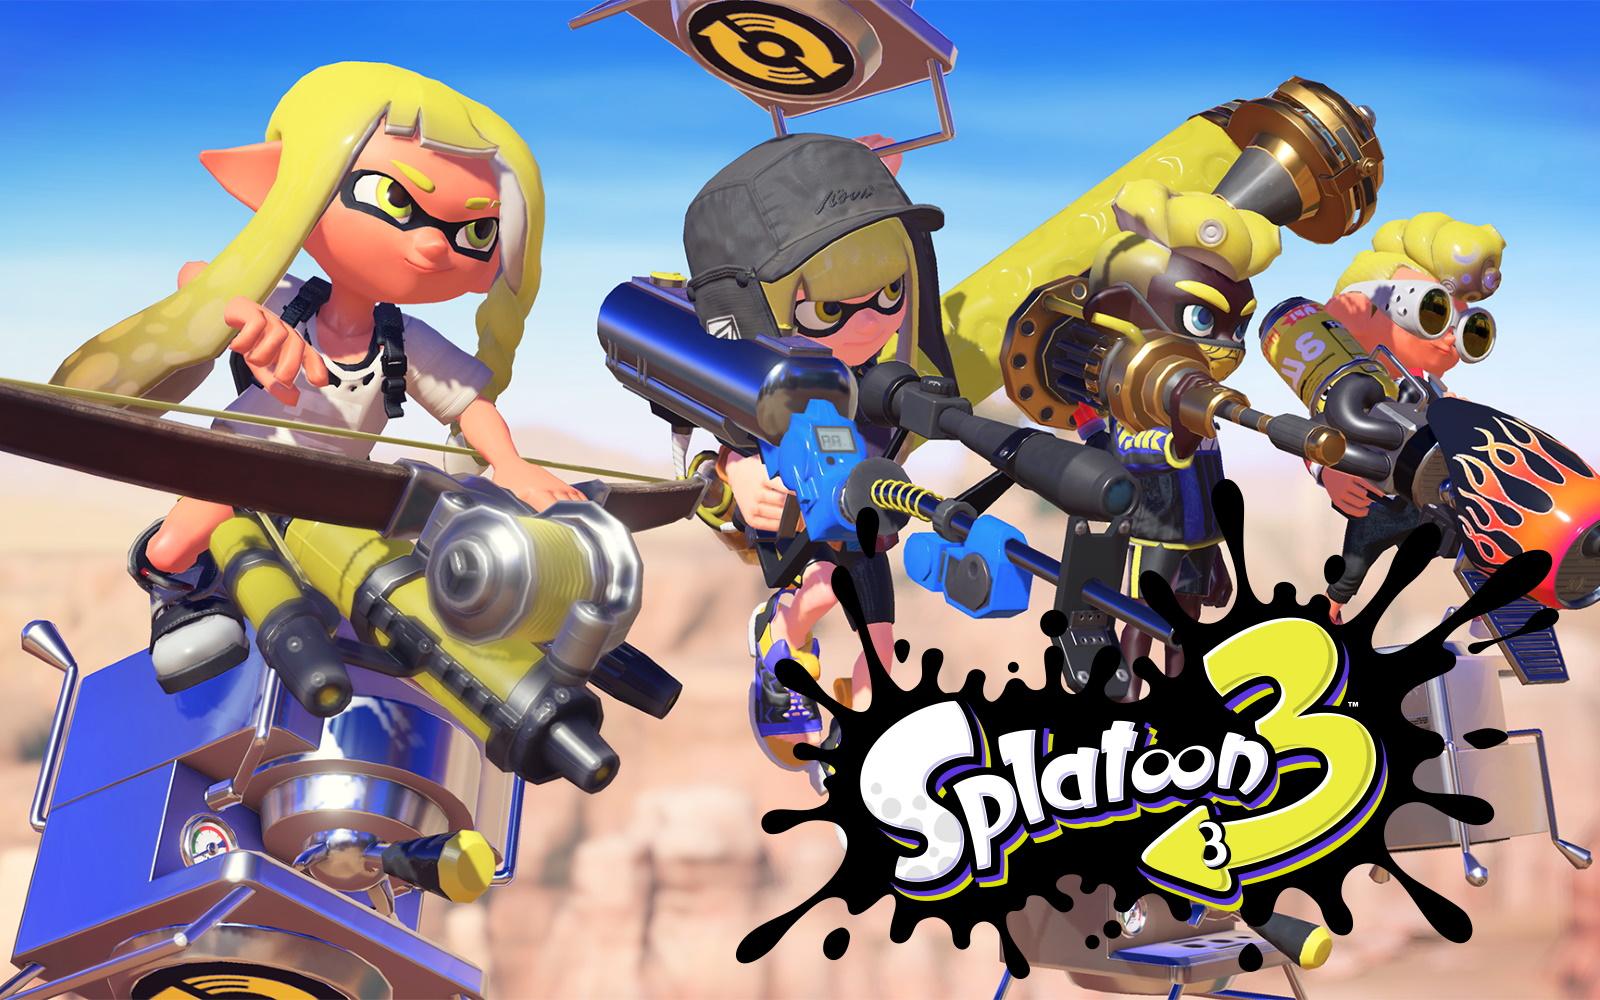 Splatoon 3 Announced For Nintendo Switch